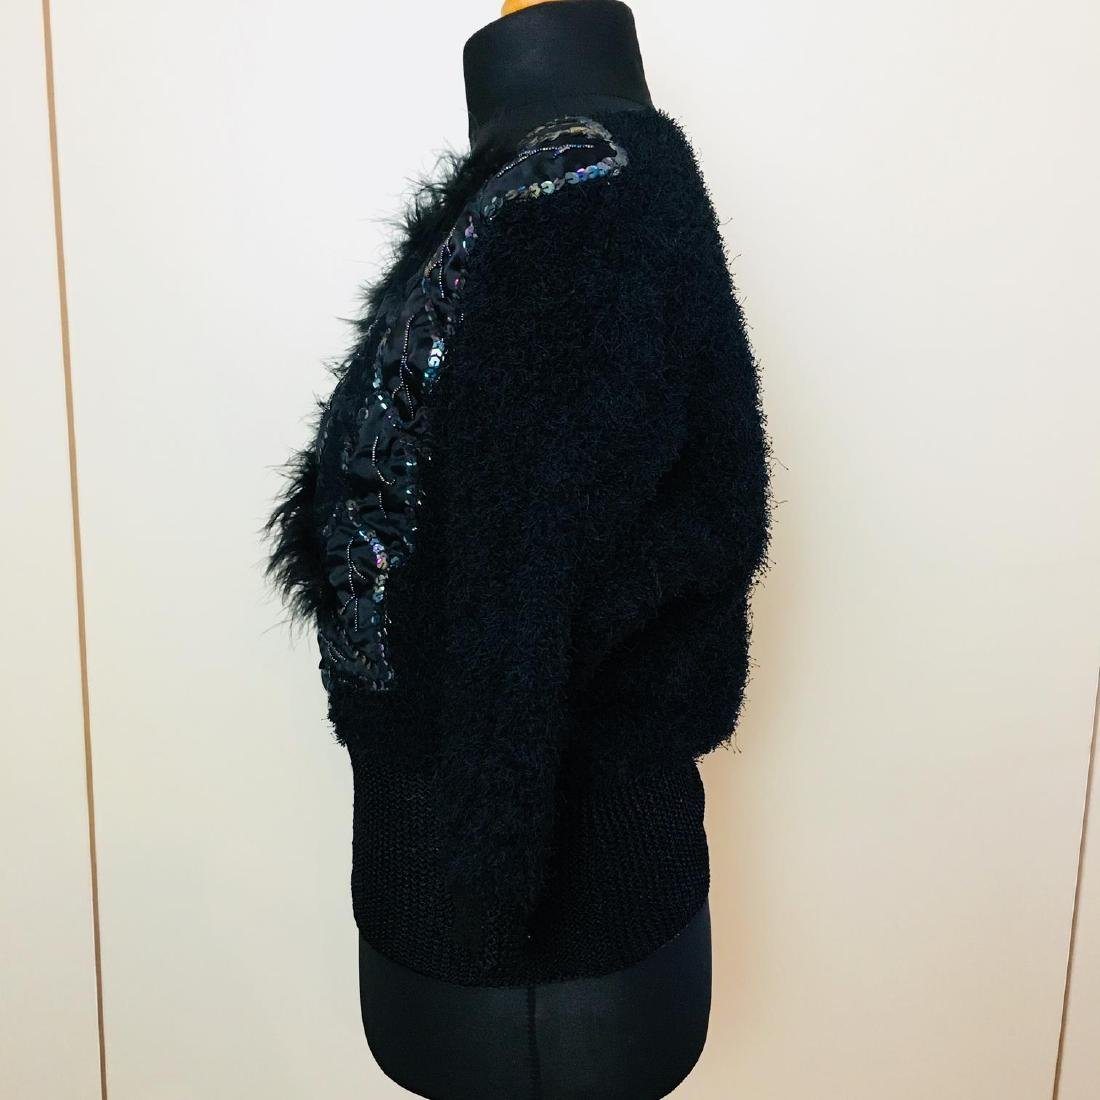 Vintage Women's Fluffy Sweater Jumper Size US 10 - 4